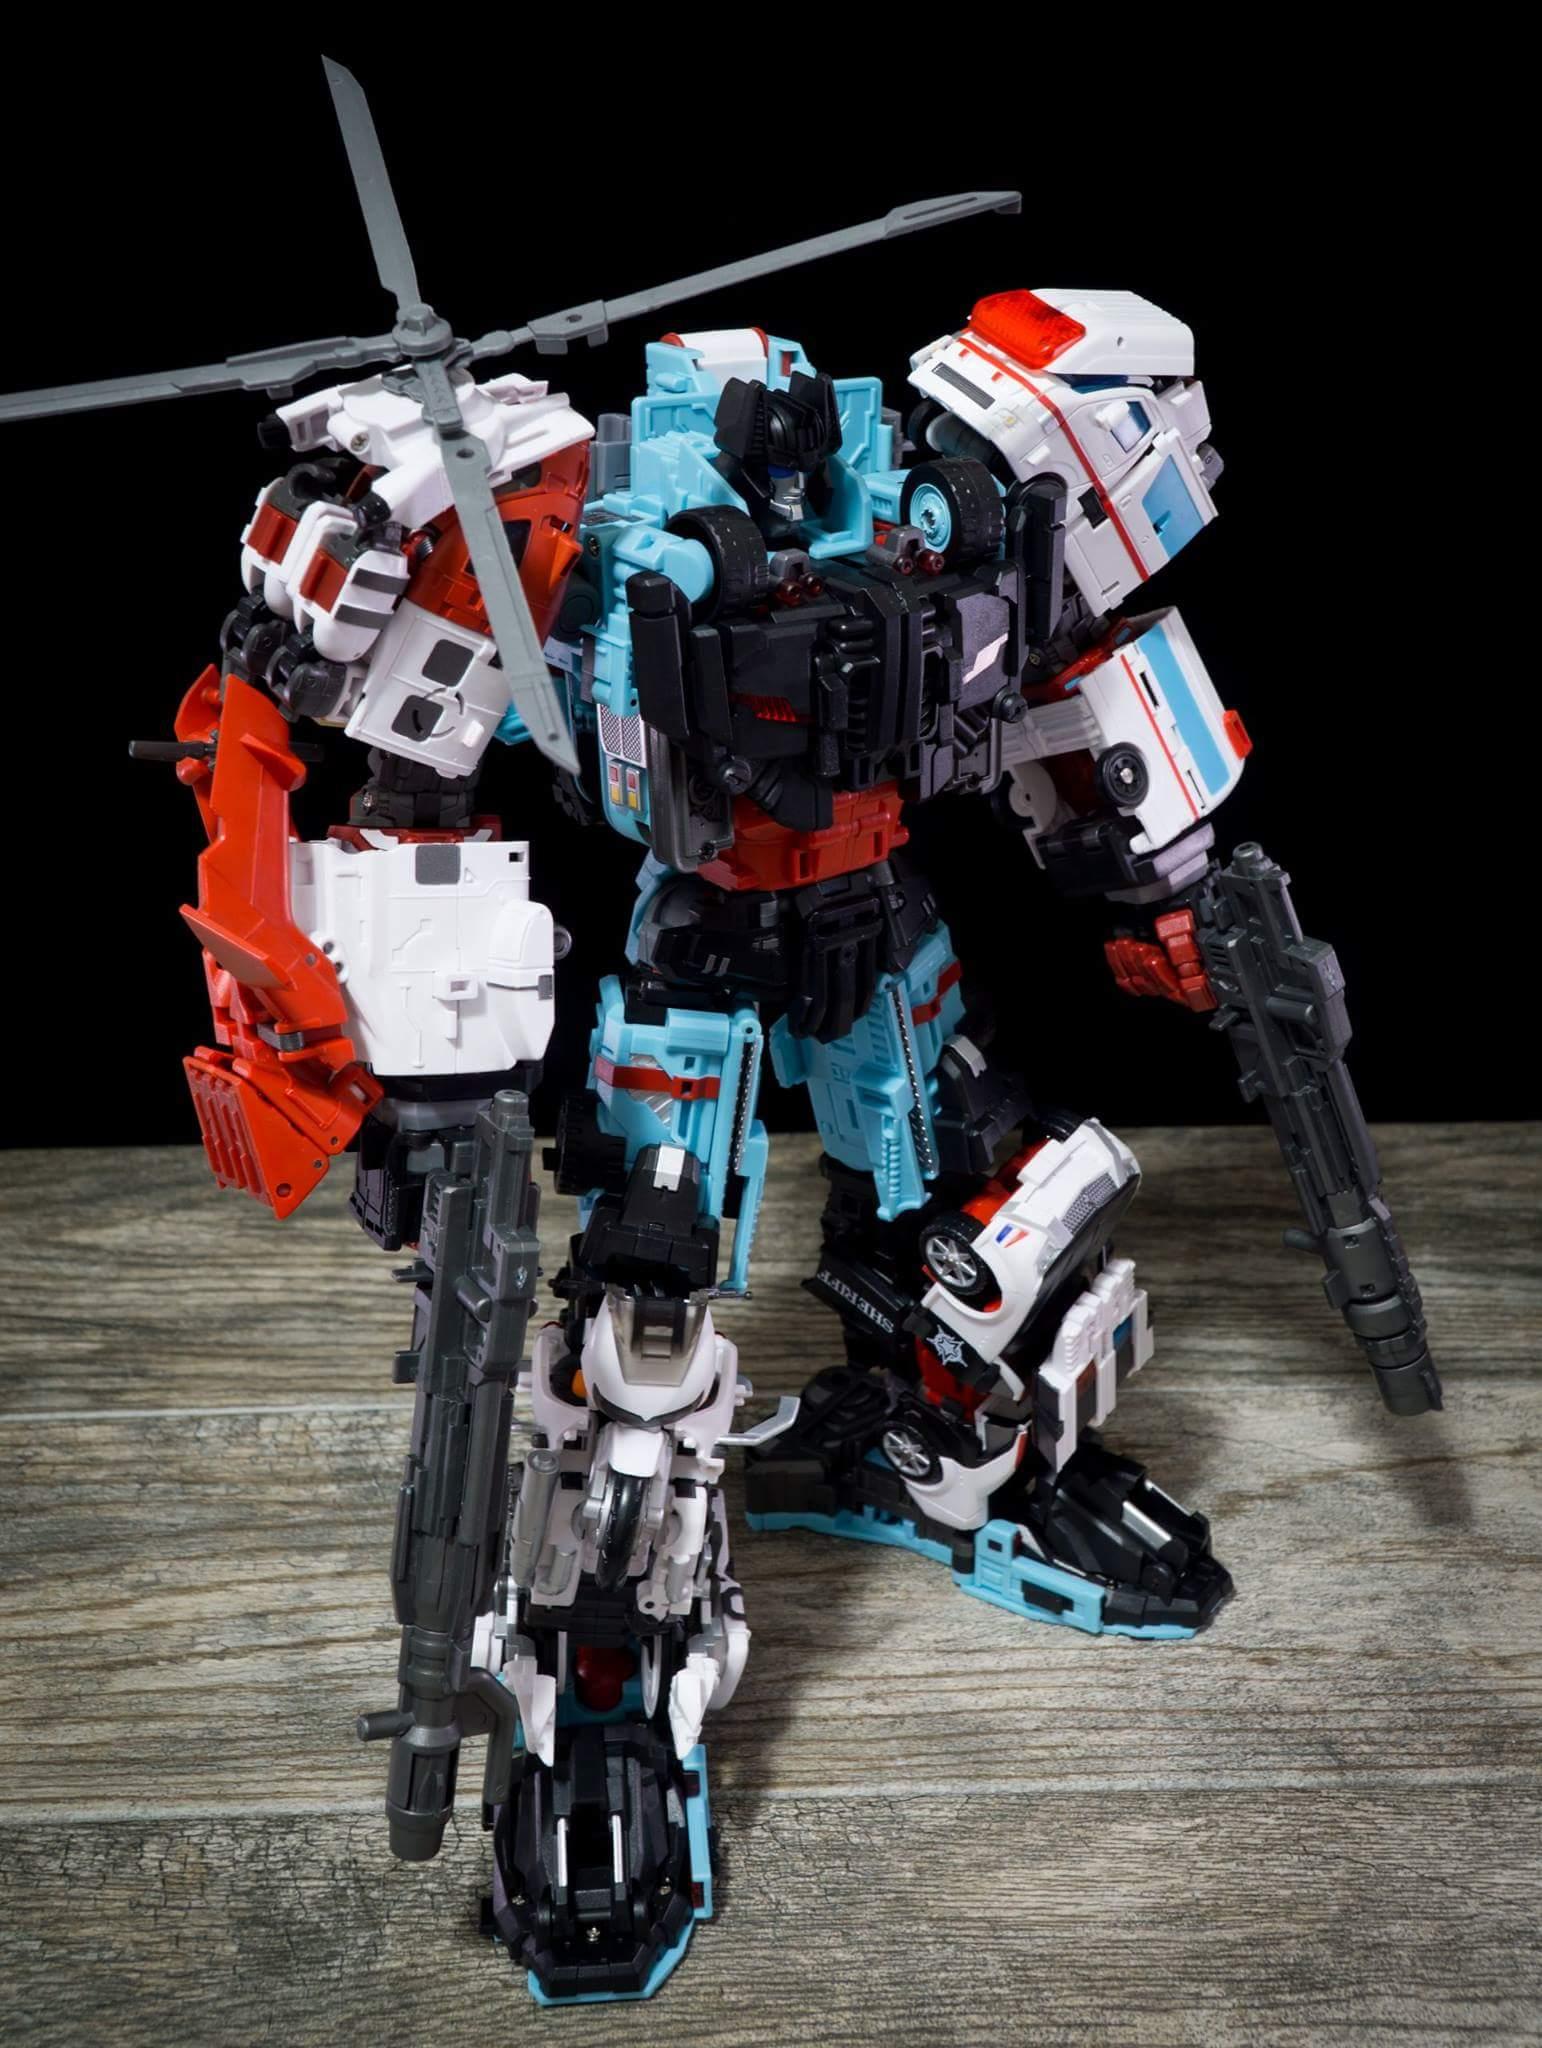 [MakeToys] Produit Tiers - Jouet MTCM-04 Guardia (aka Protectobots - Defensor/Defenso) - Page 4 NeSBZbQu